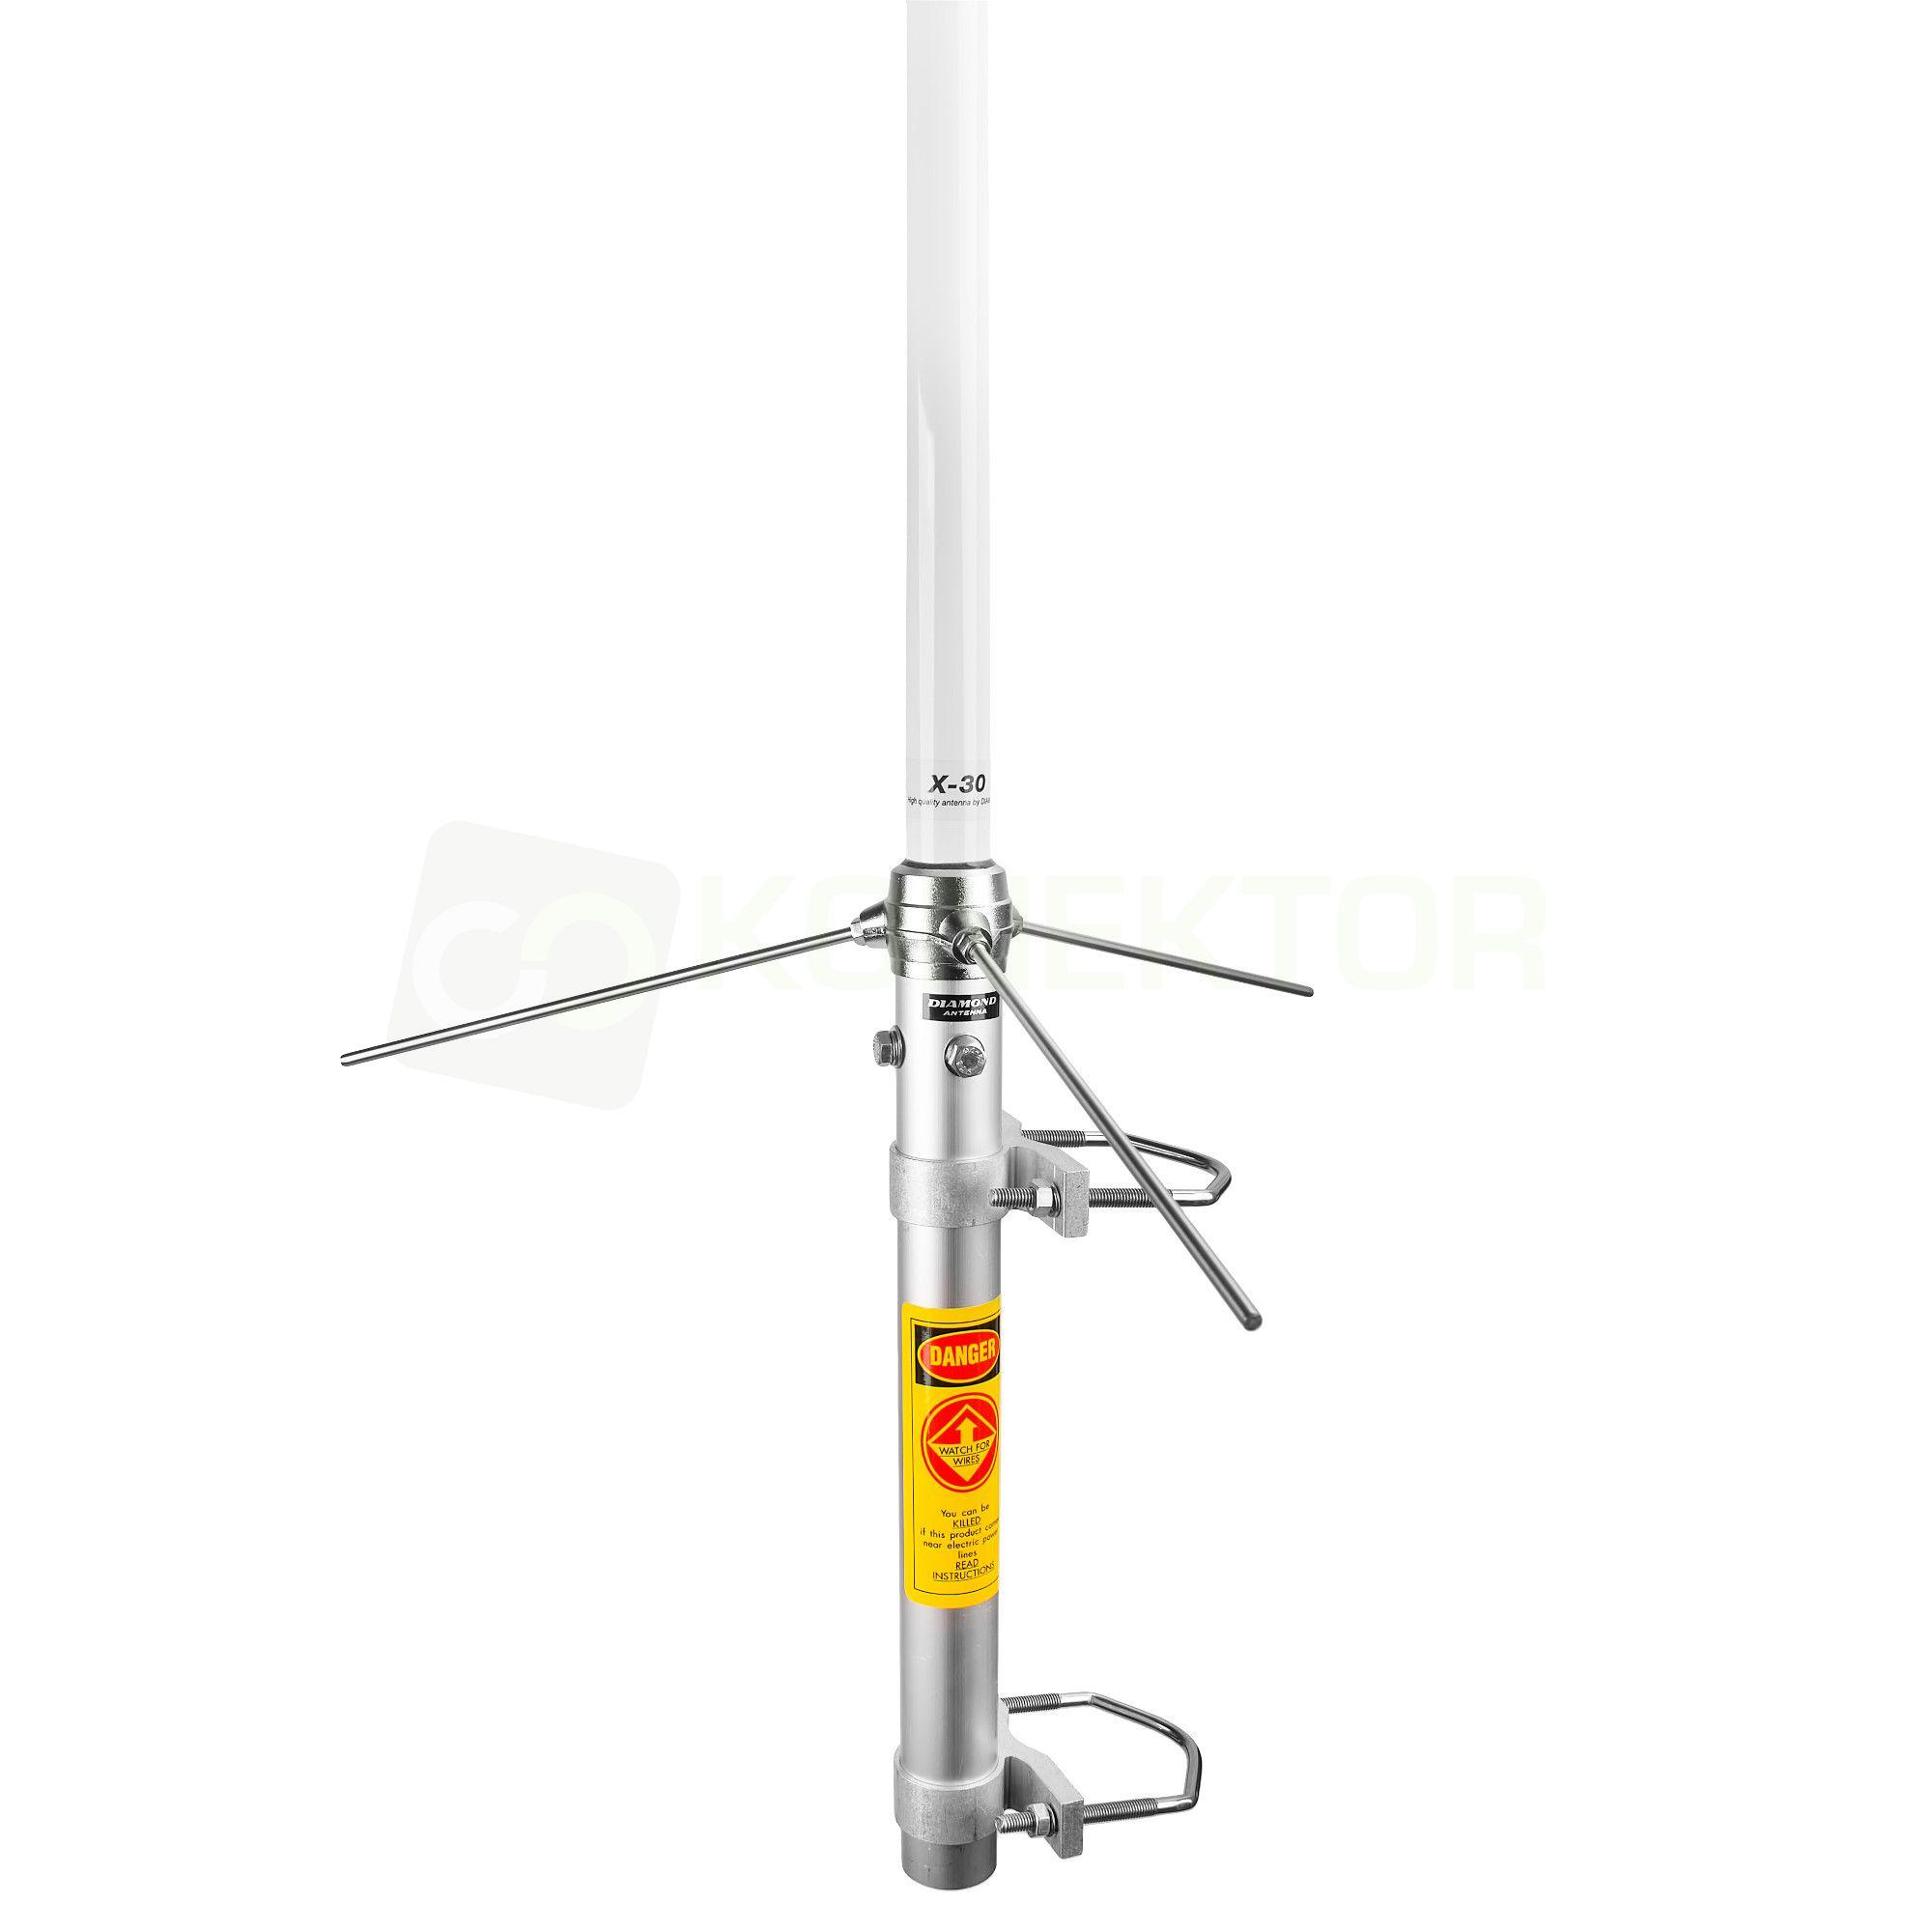 Diamond x30n antena pionowa 2m 70cm d ugo 130cm for Ecksofa 2m x 2m